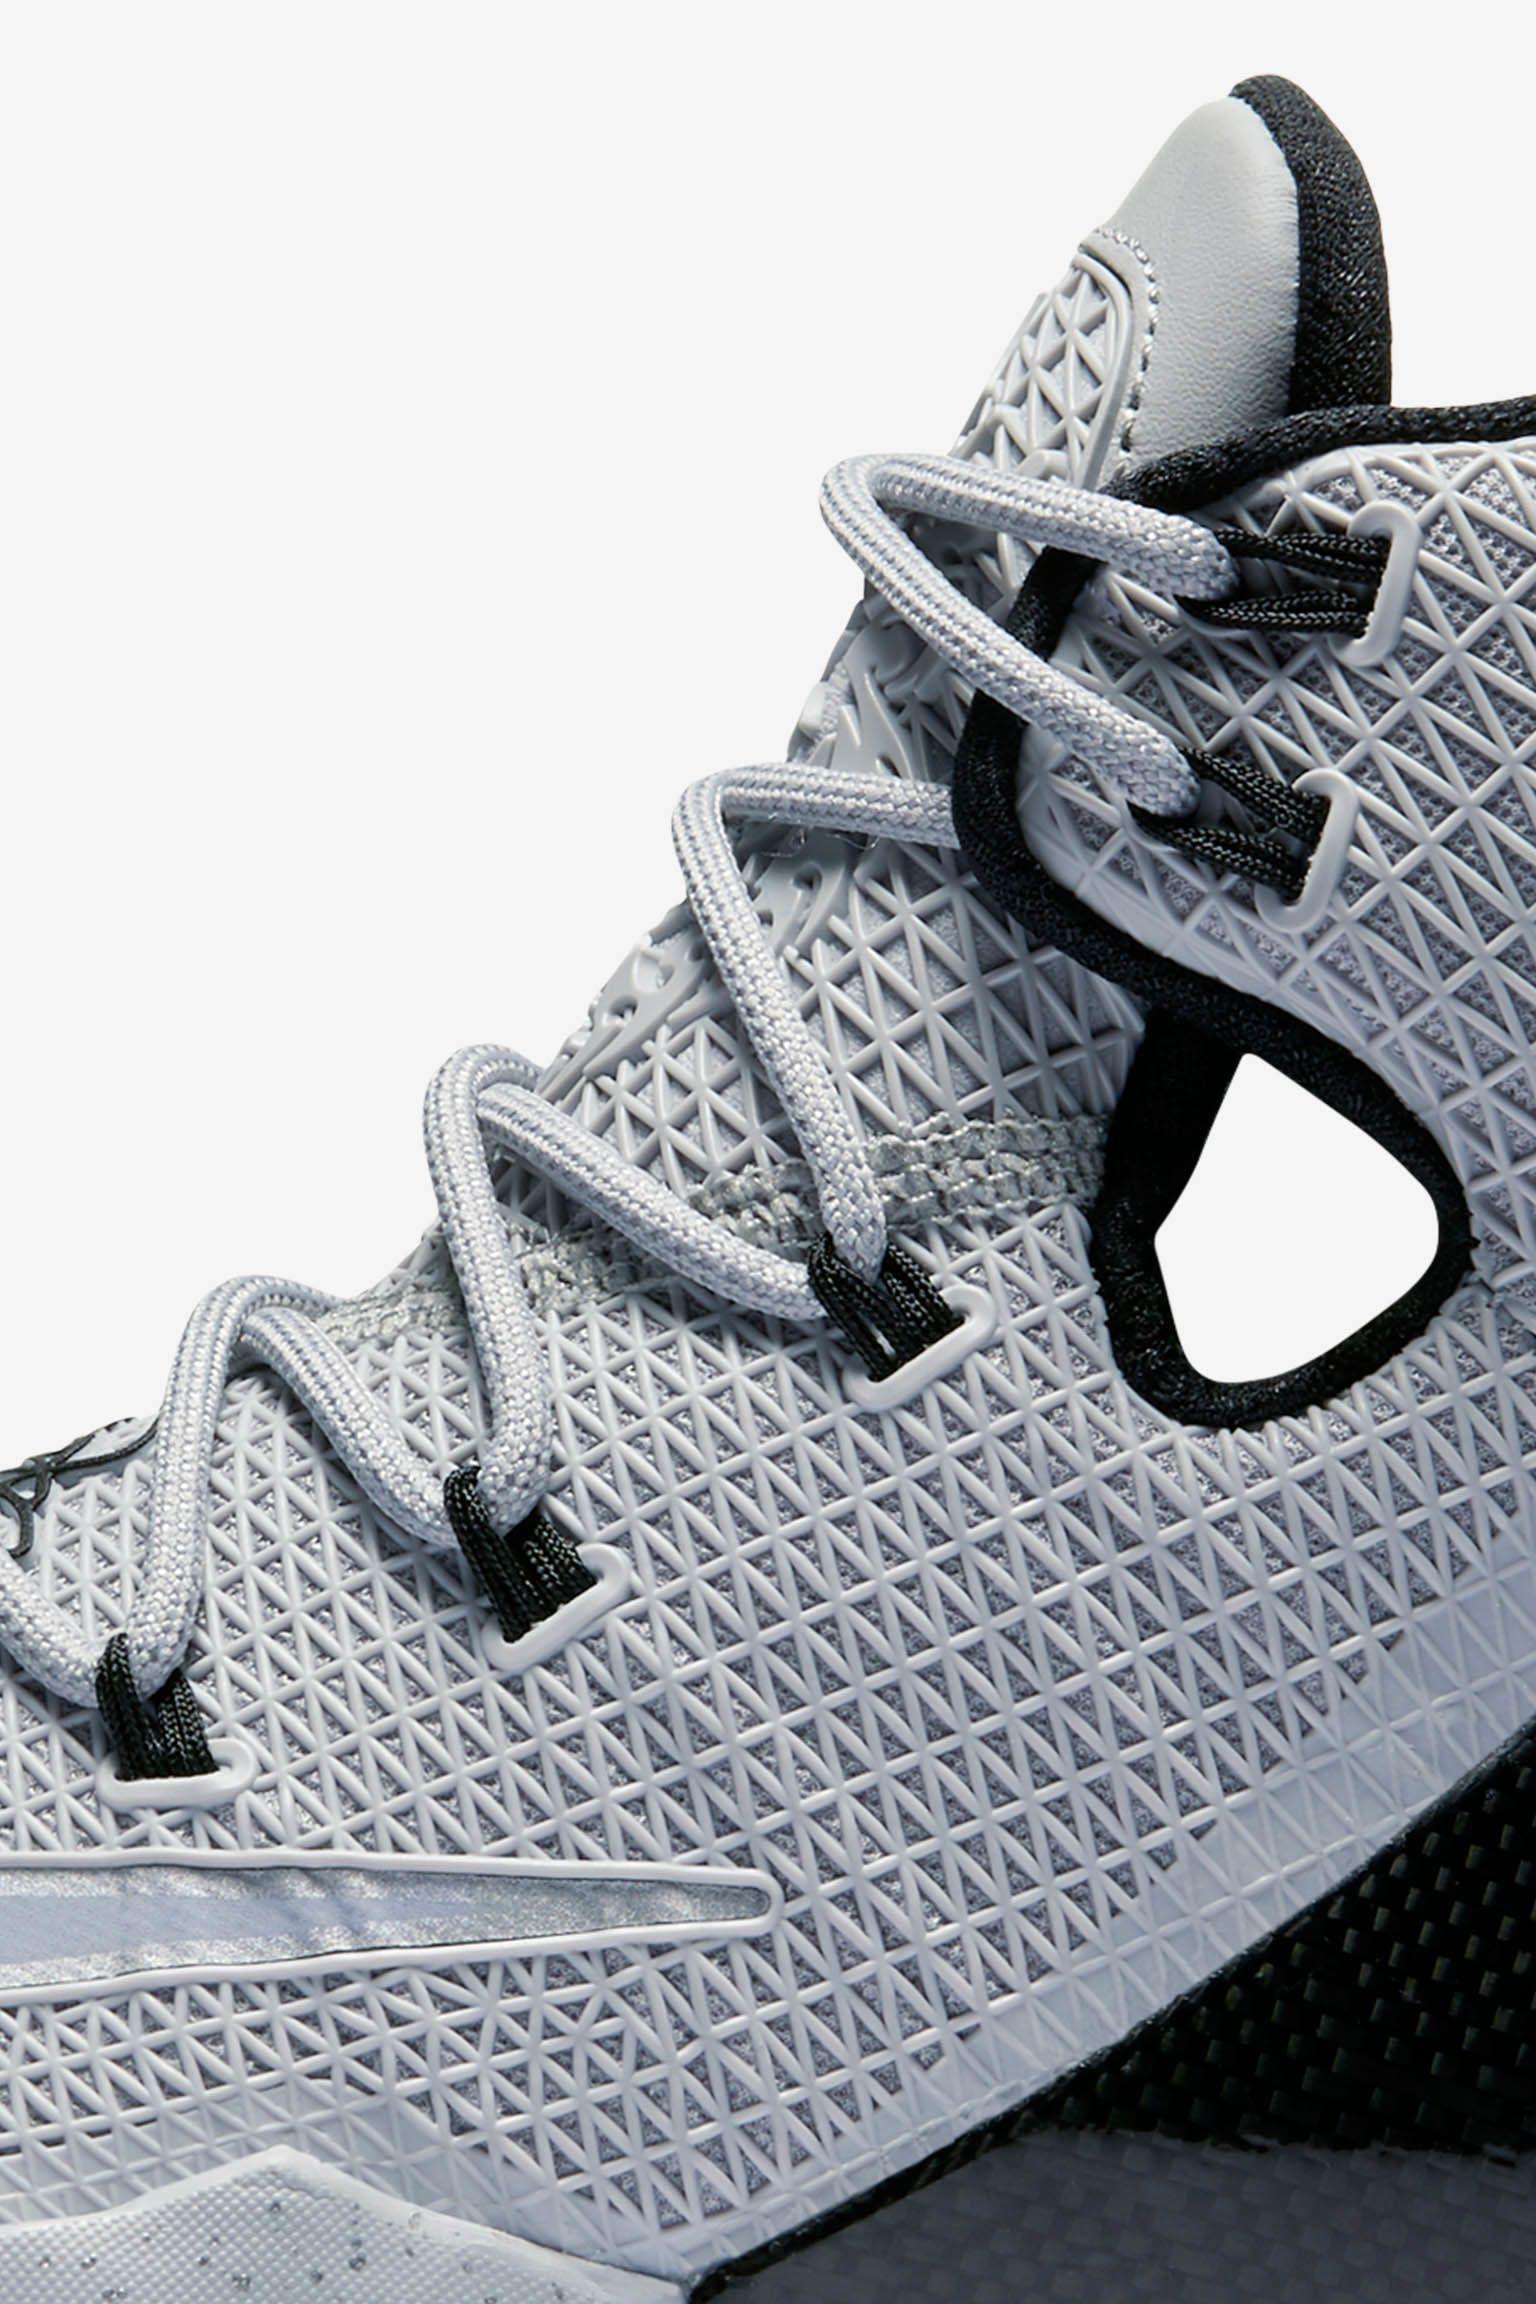 Nike LeBron 13 Elite 'Wolf Grey' Release Date